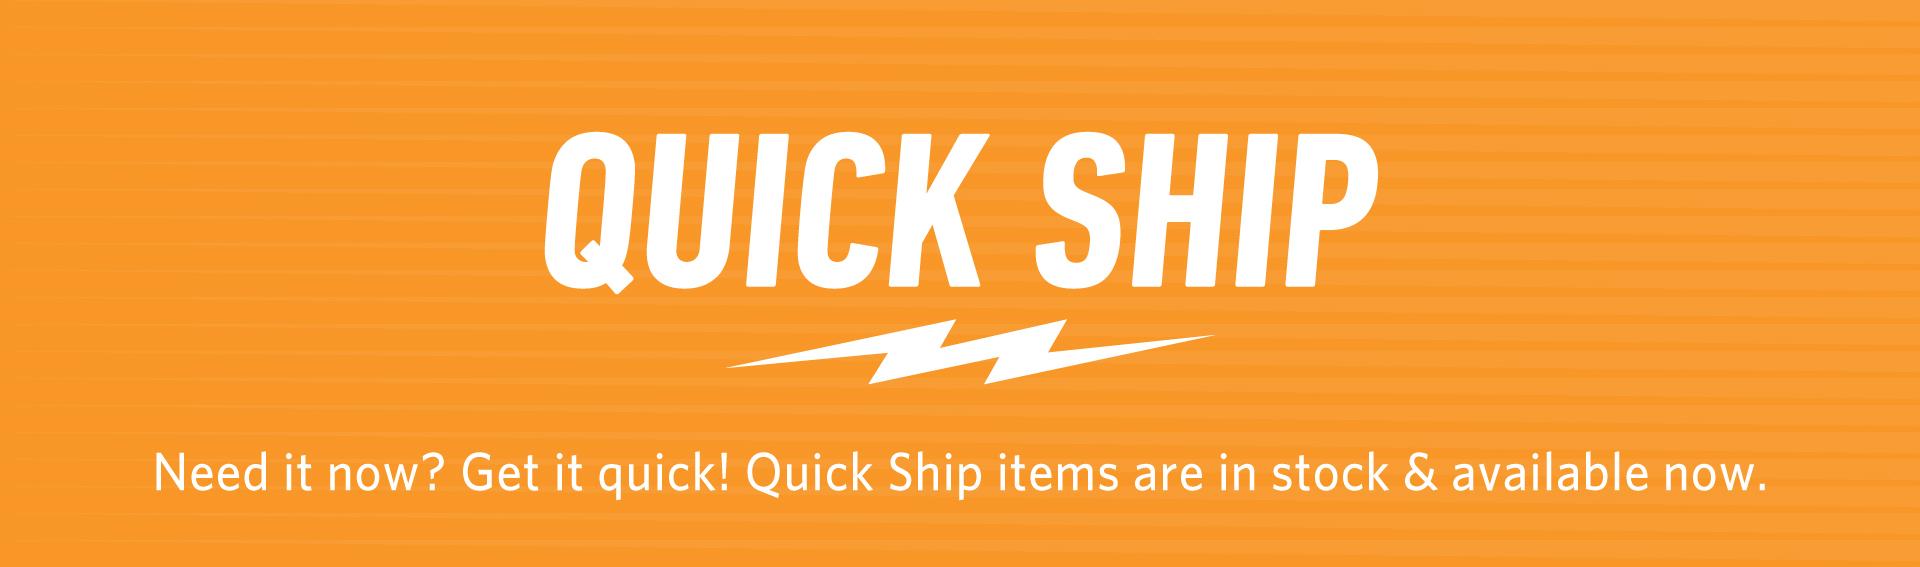 quickship-2021-sliders-01.jpg